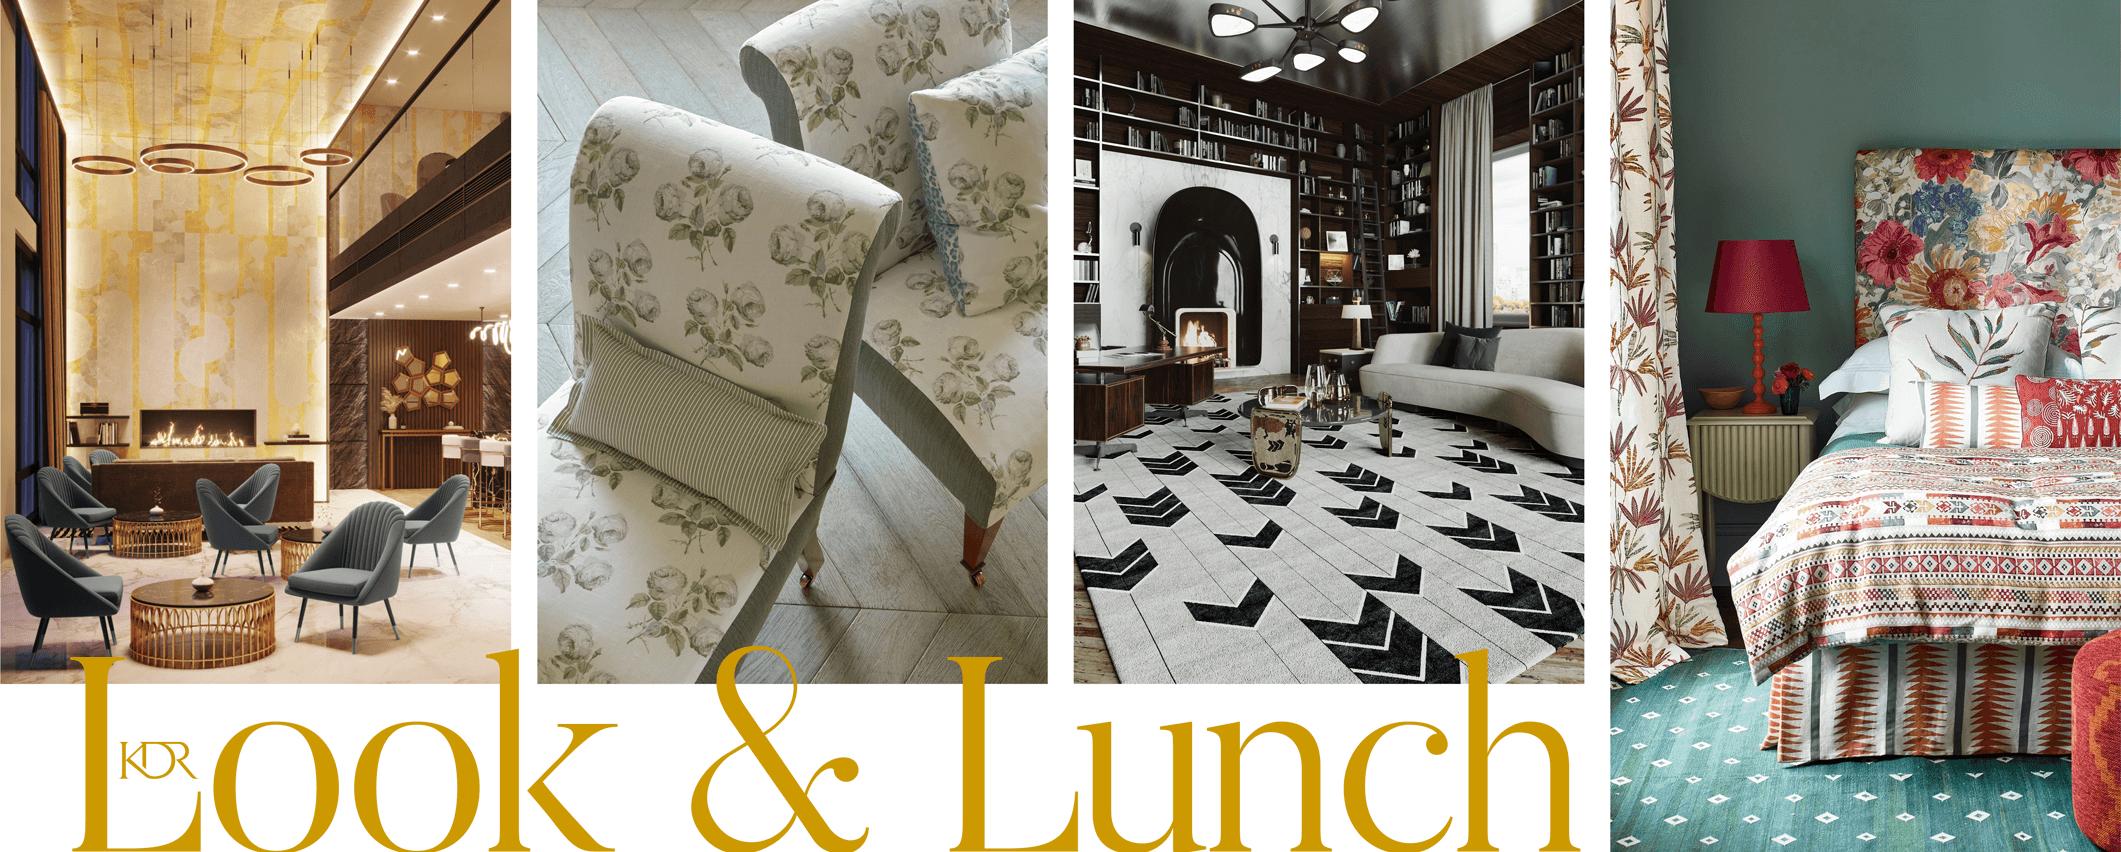 KDR Look & Lunch 2020 Header